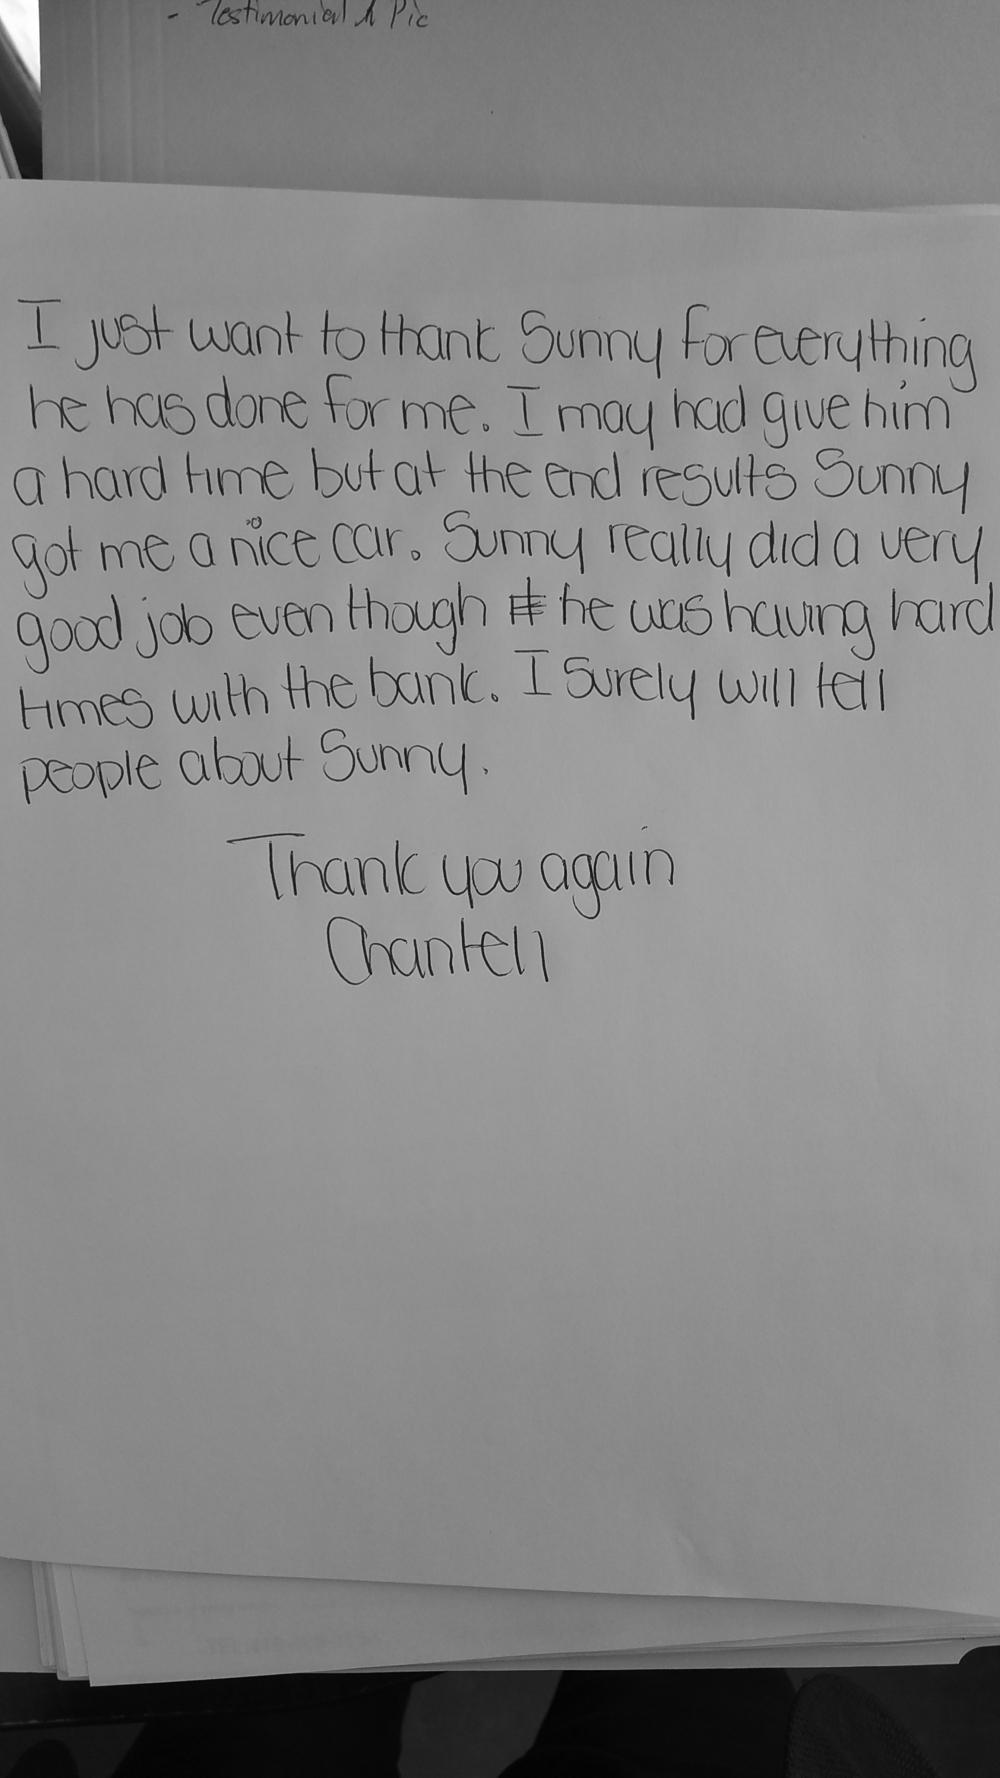 Chantell Casey_Testimonial.jpg